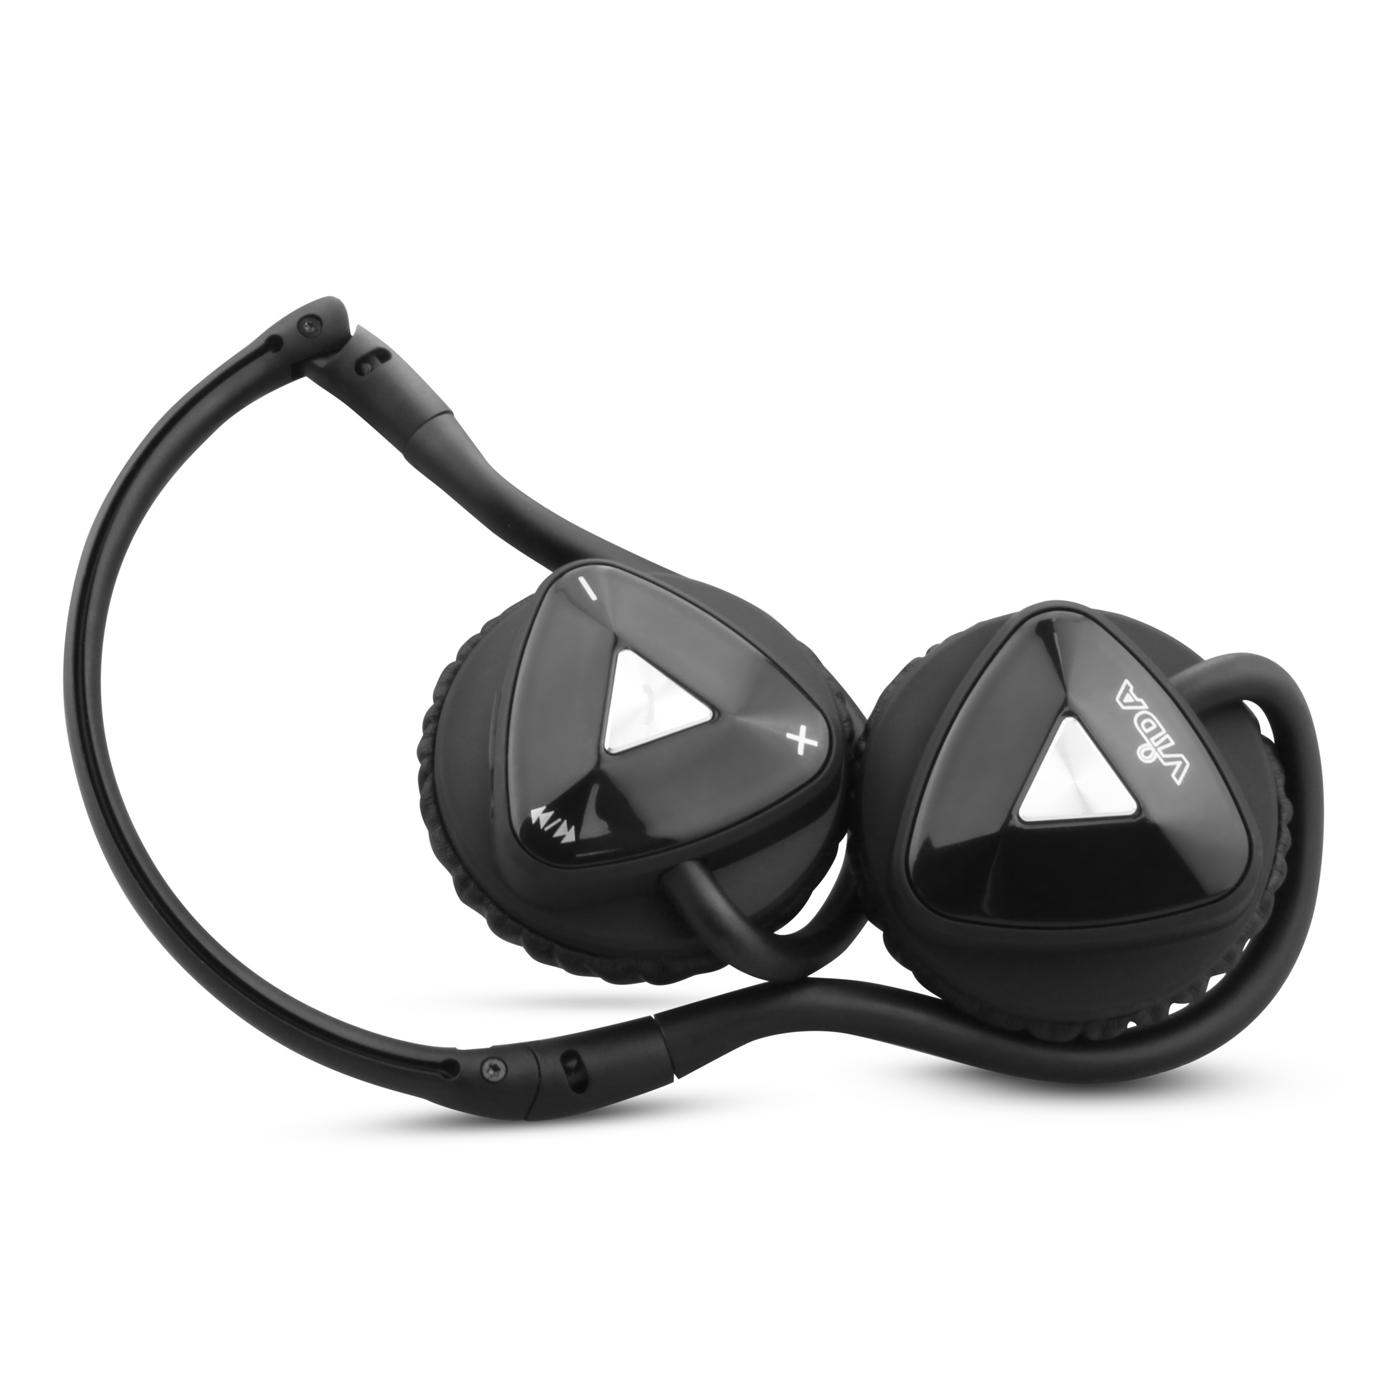 bsh20 bluetooth headset kopfh rer f r samsung galaxy s3 s4. Black Bedroom Furniture Sets. Home Design Ideas